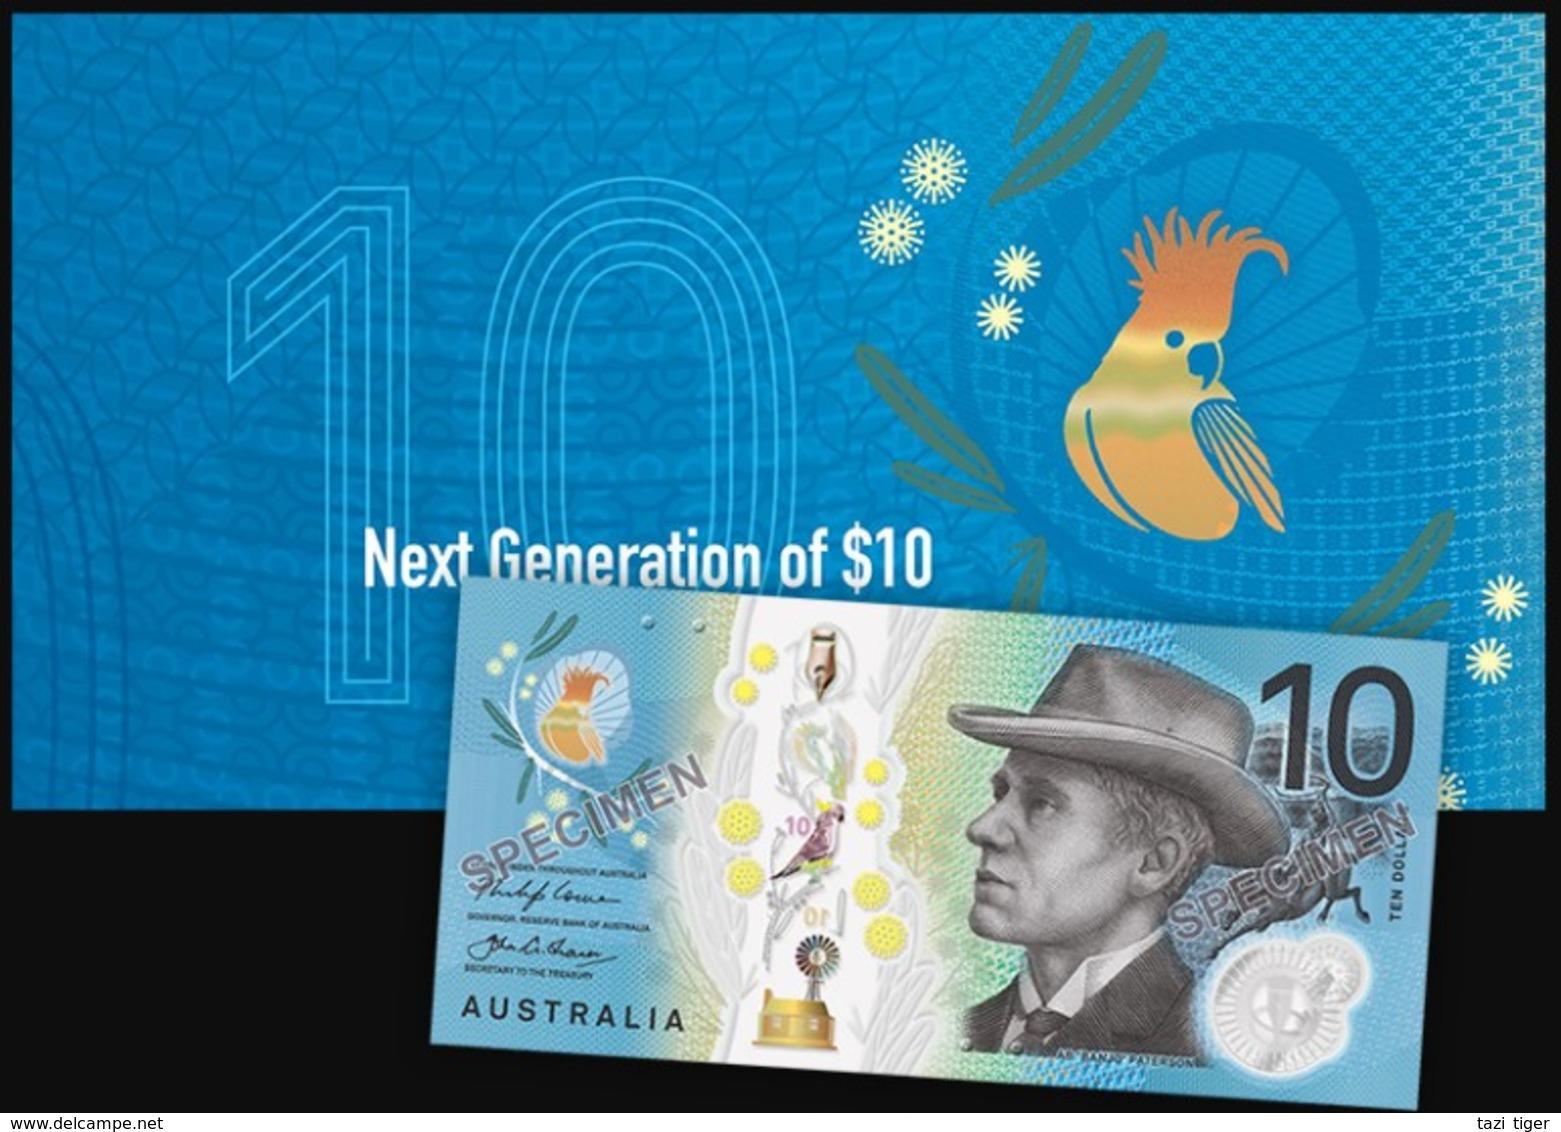 AUSTRALIA • 2017 • RBA Folder • $10 Next Generation • Uncirculated - Decimal Government Issues 1966-...